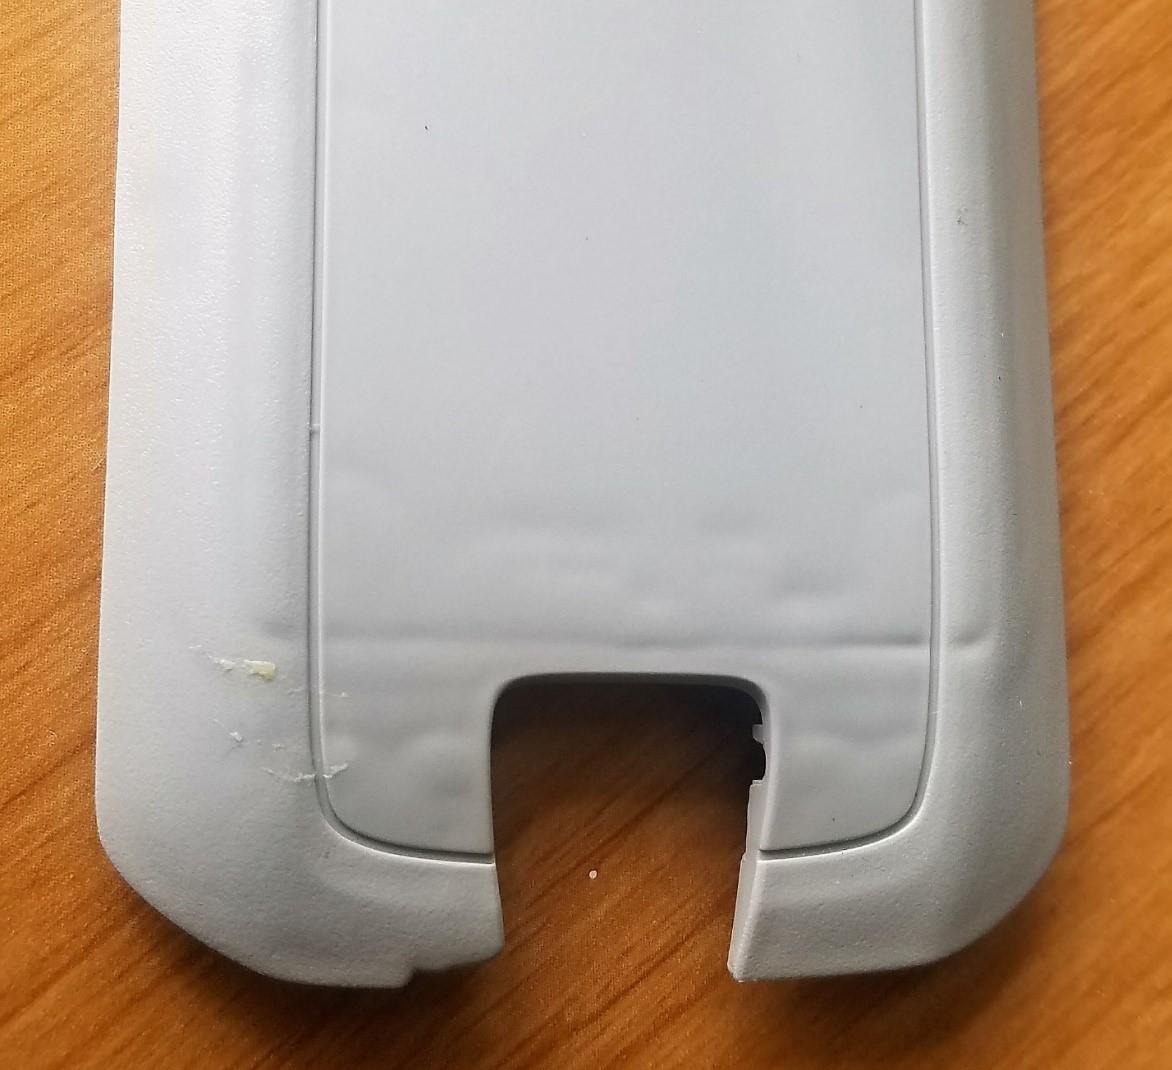 broken cellphone cap